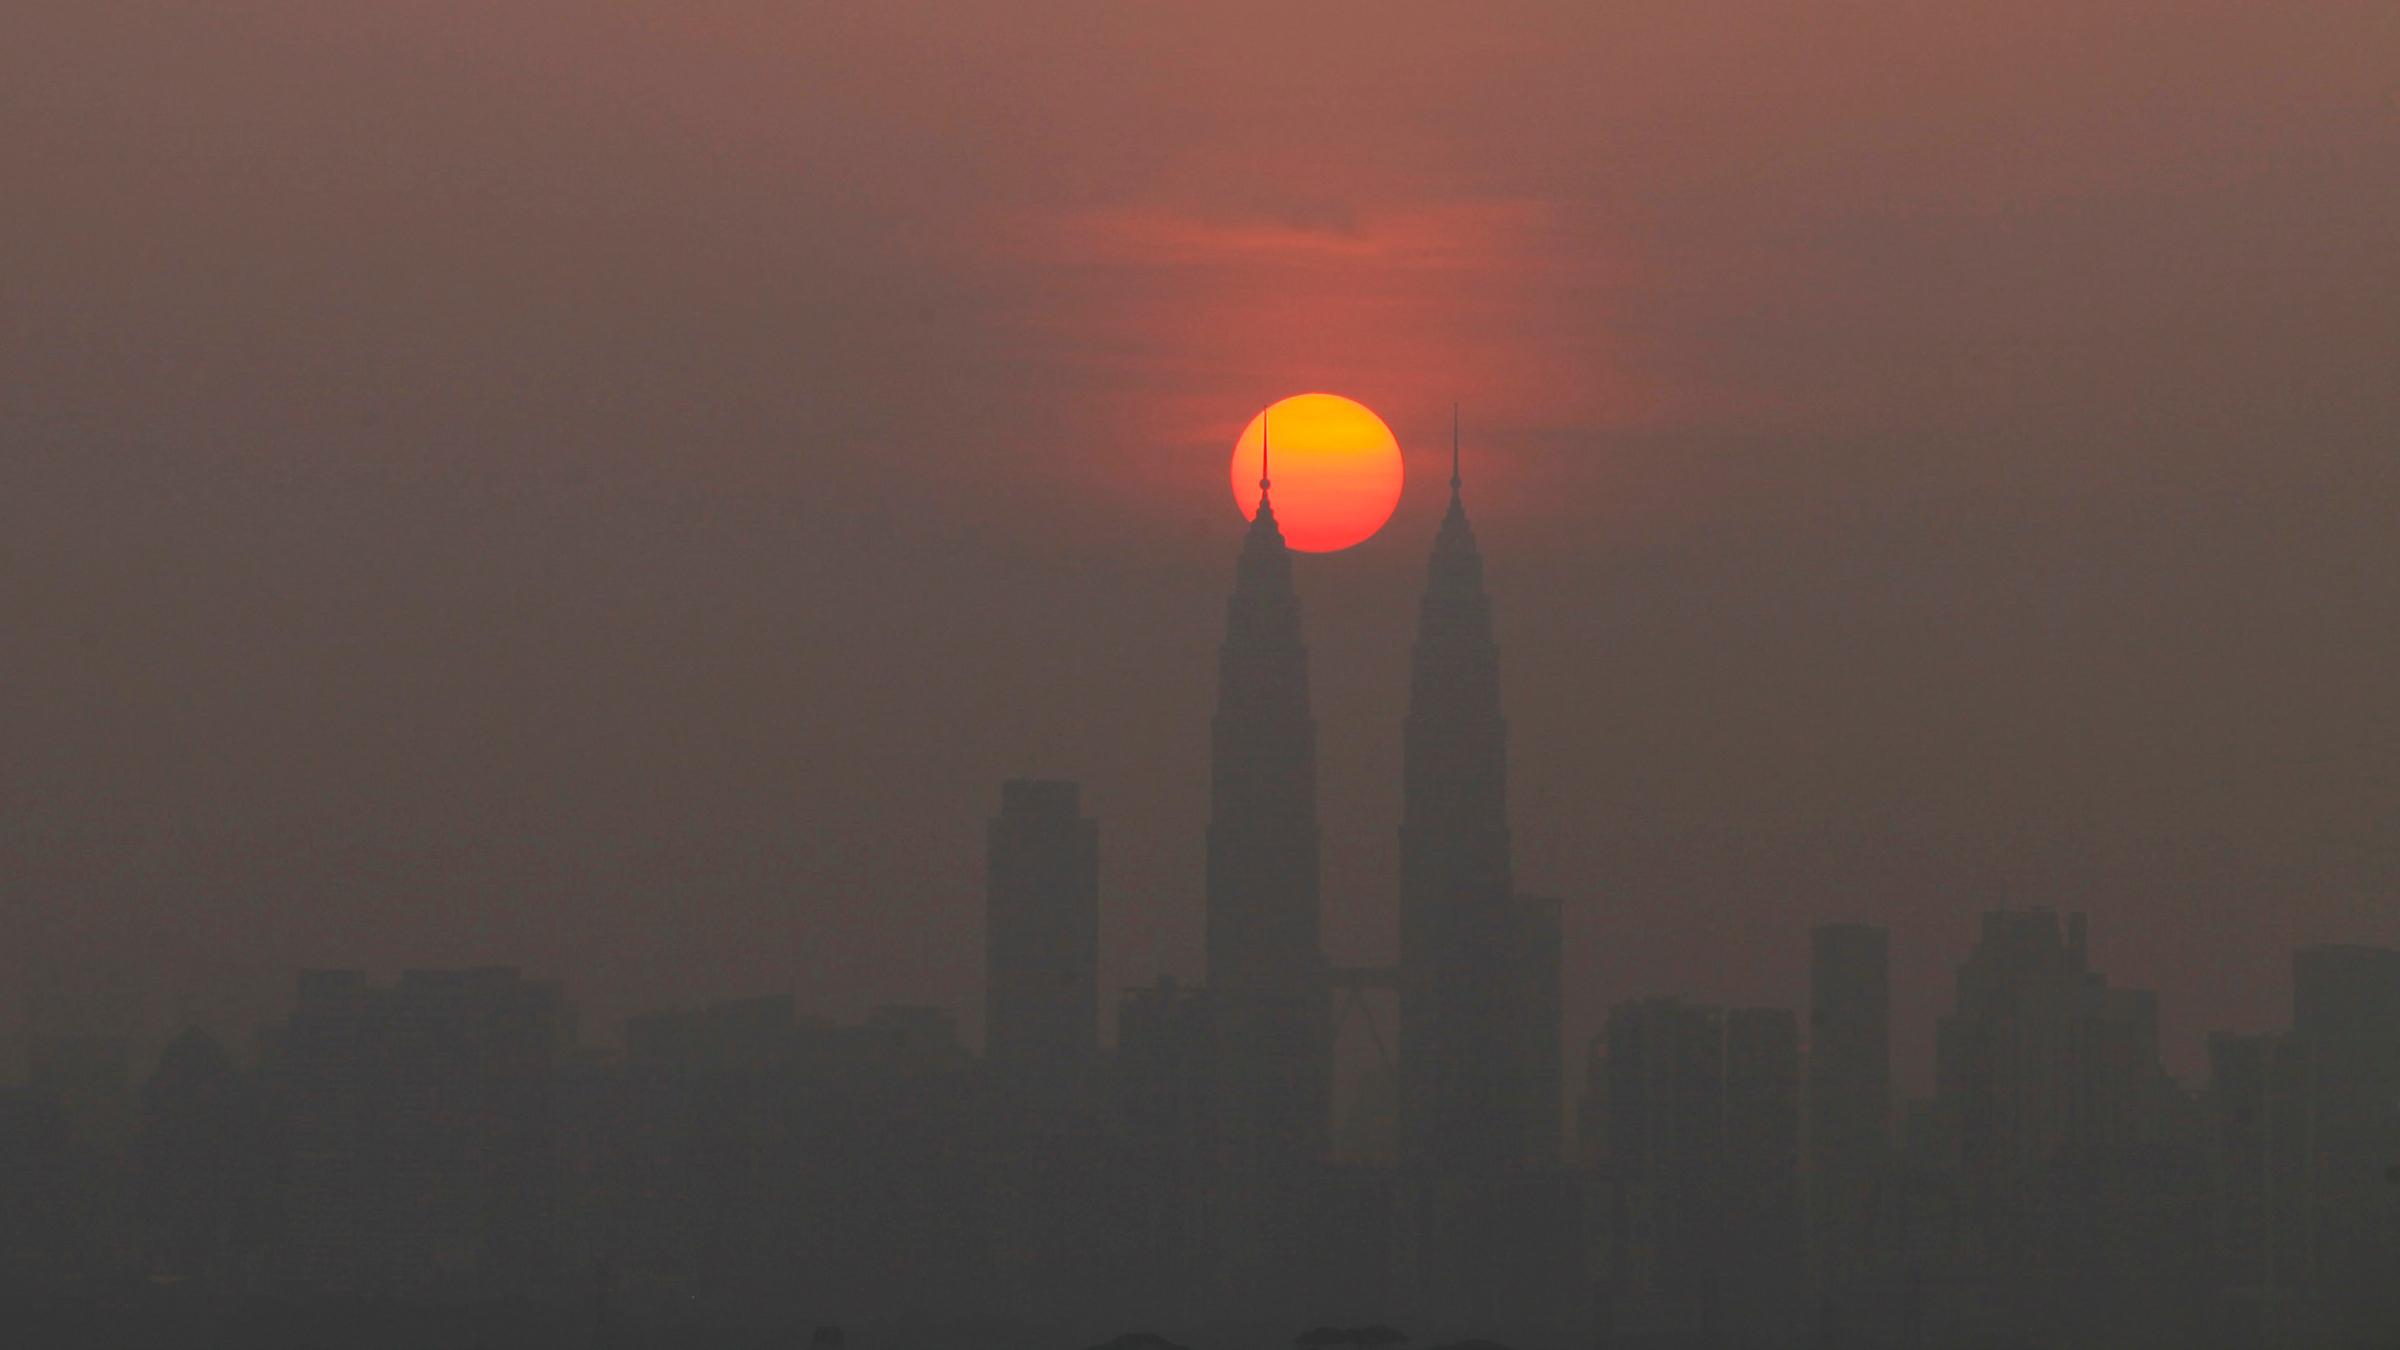 Dark days lie ahead for Malaysia.